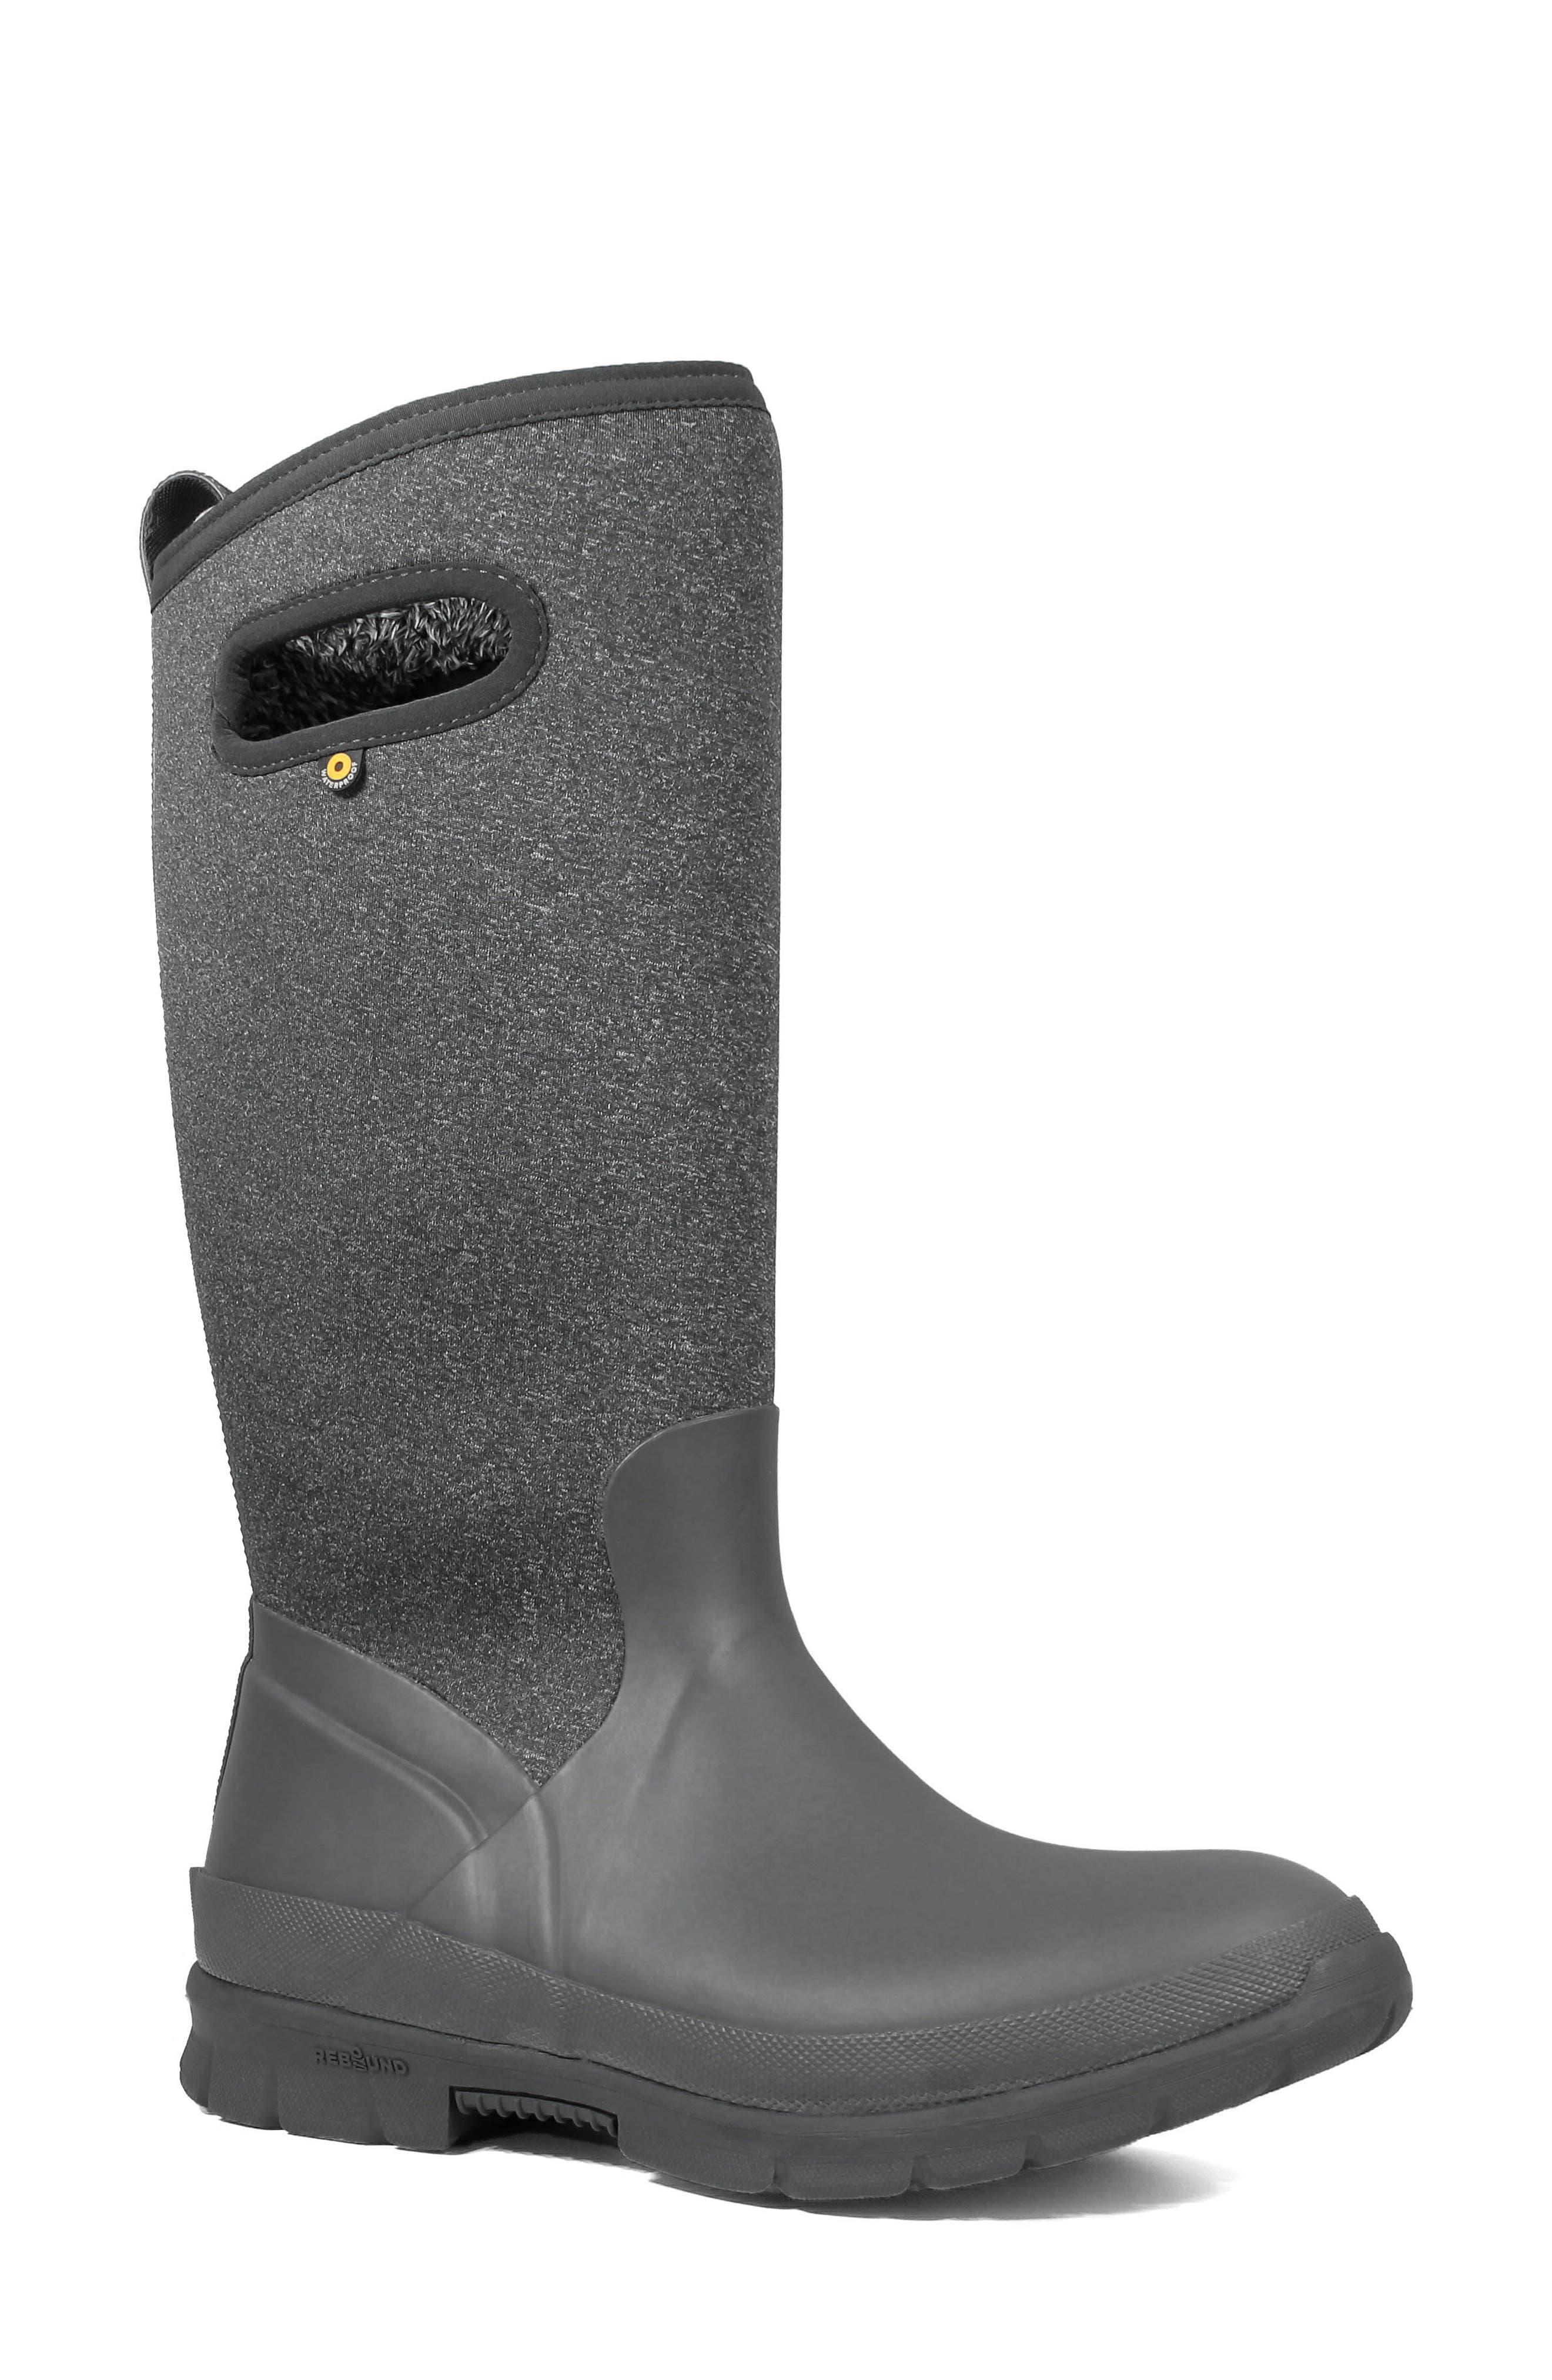 Bogs Crandall Waterproof Tall Boot, Grey